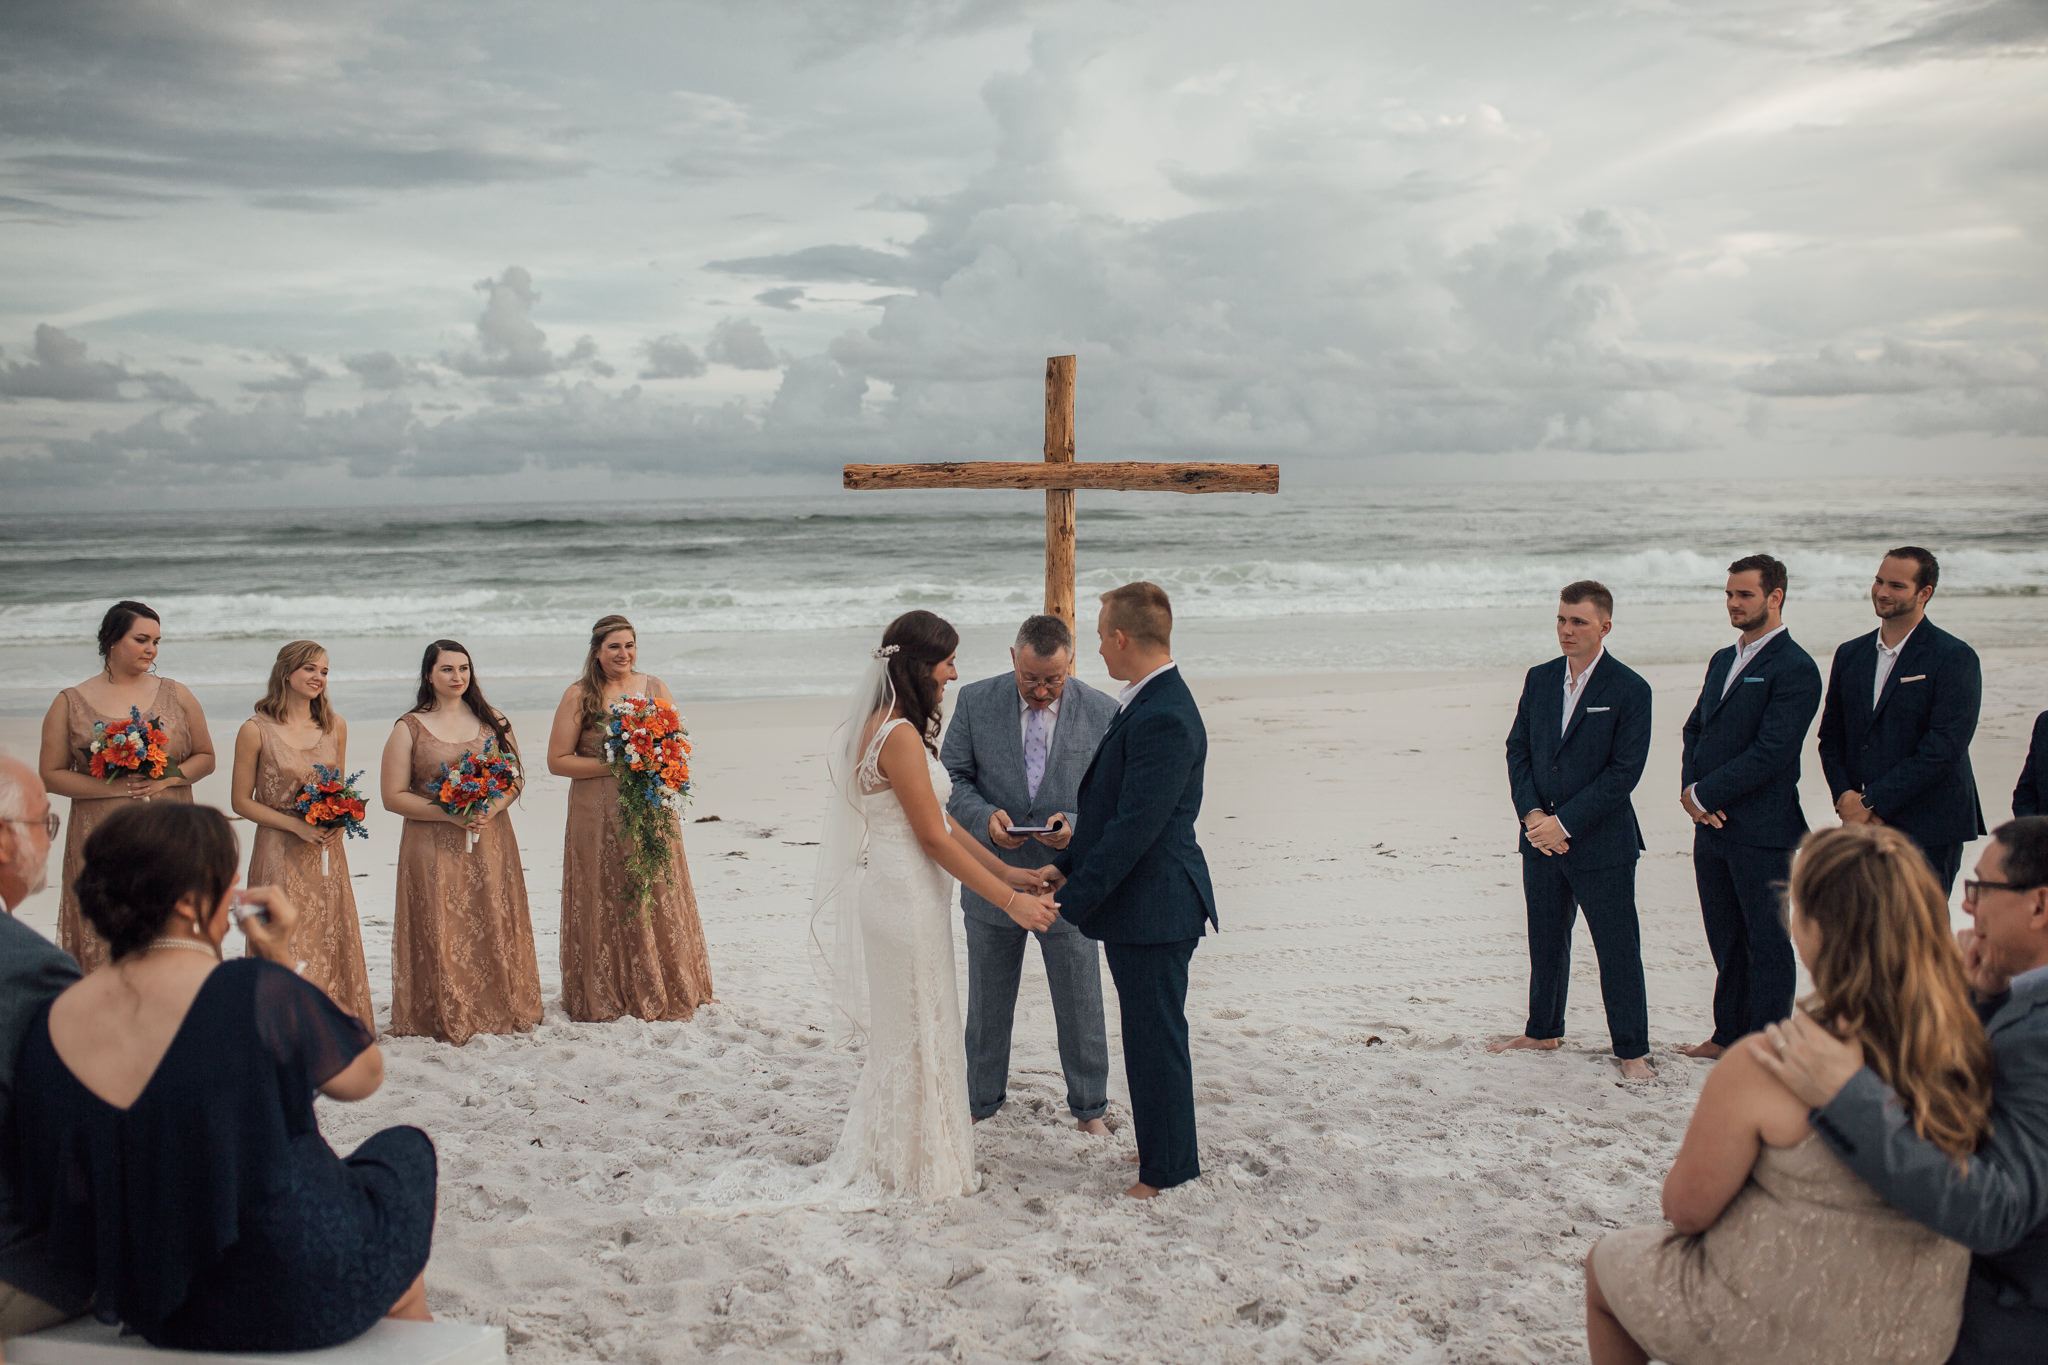 cassie-cook-photography-santa-rosa-beach-wedding-farrar-wedding-71.jpg